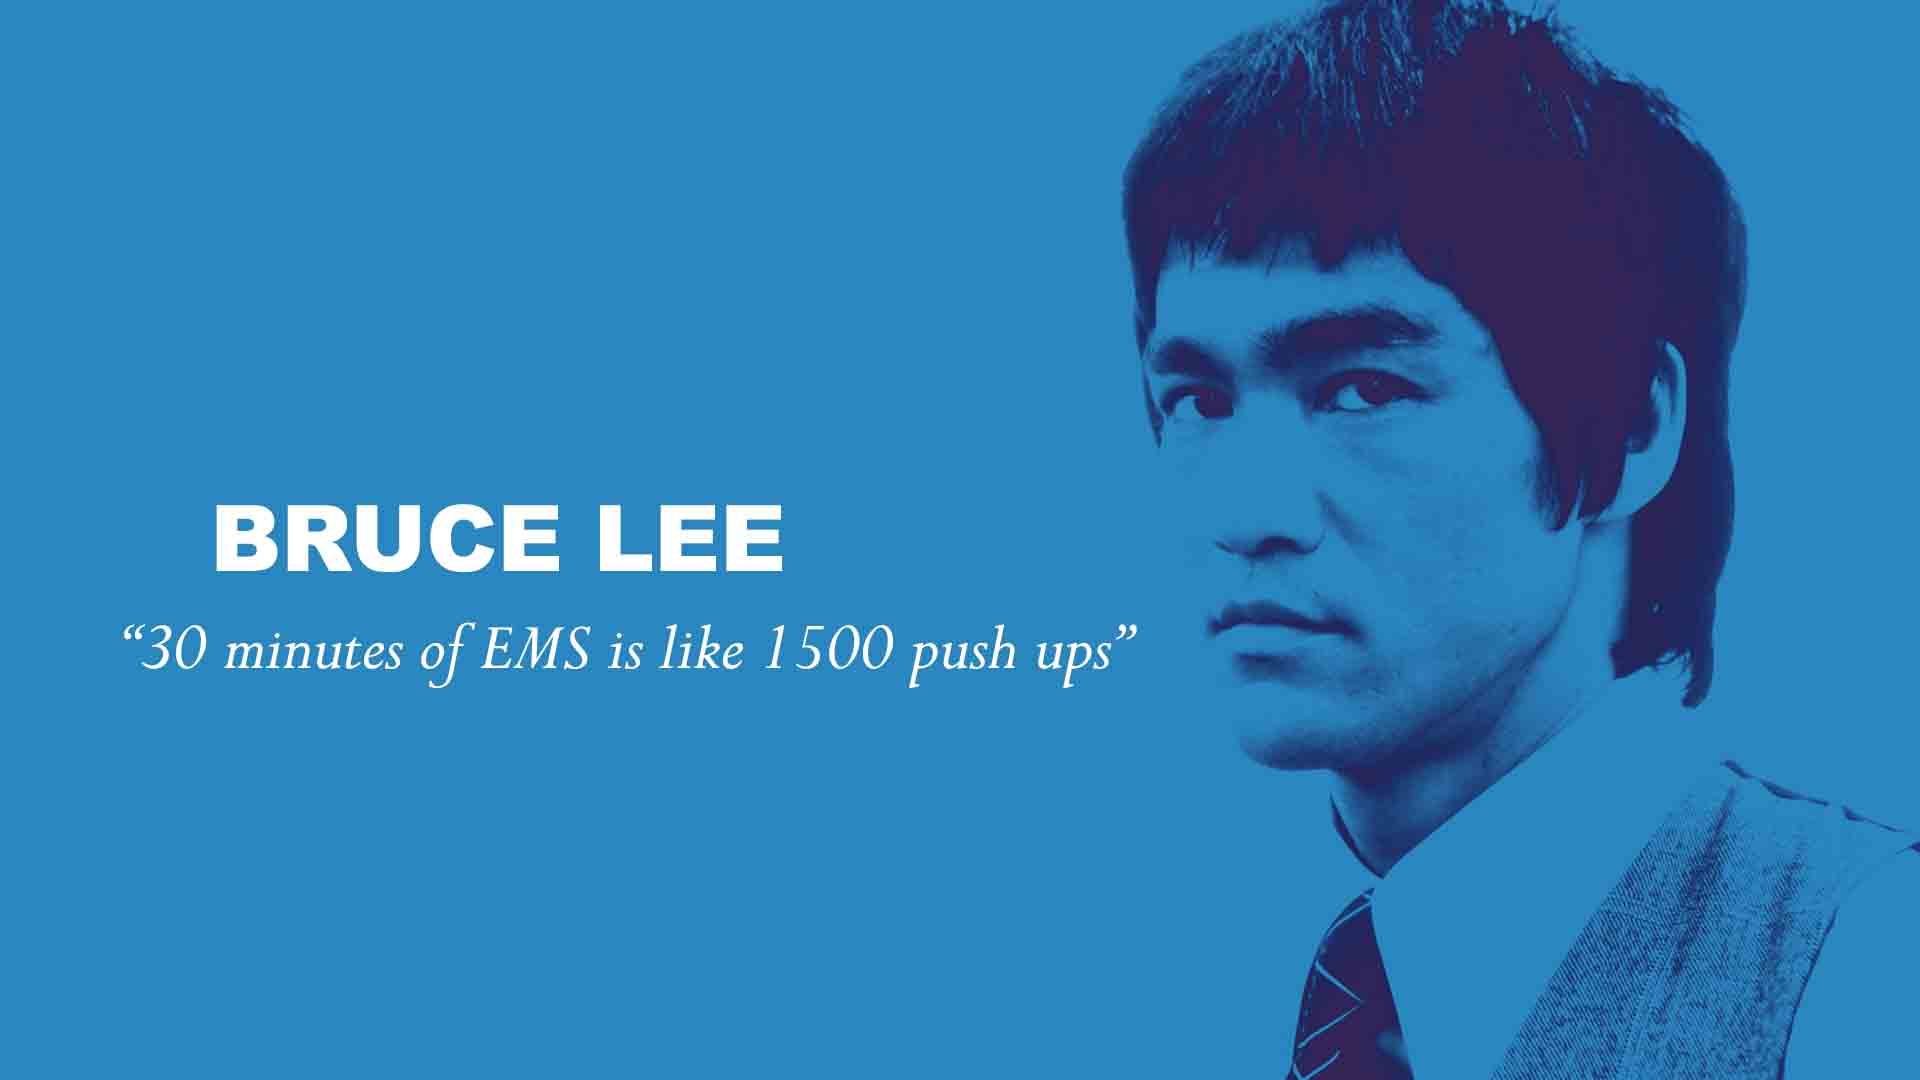 Bruce Lee HD Wallpapers 7wallpapersnet 1920x1080